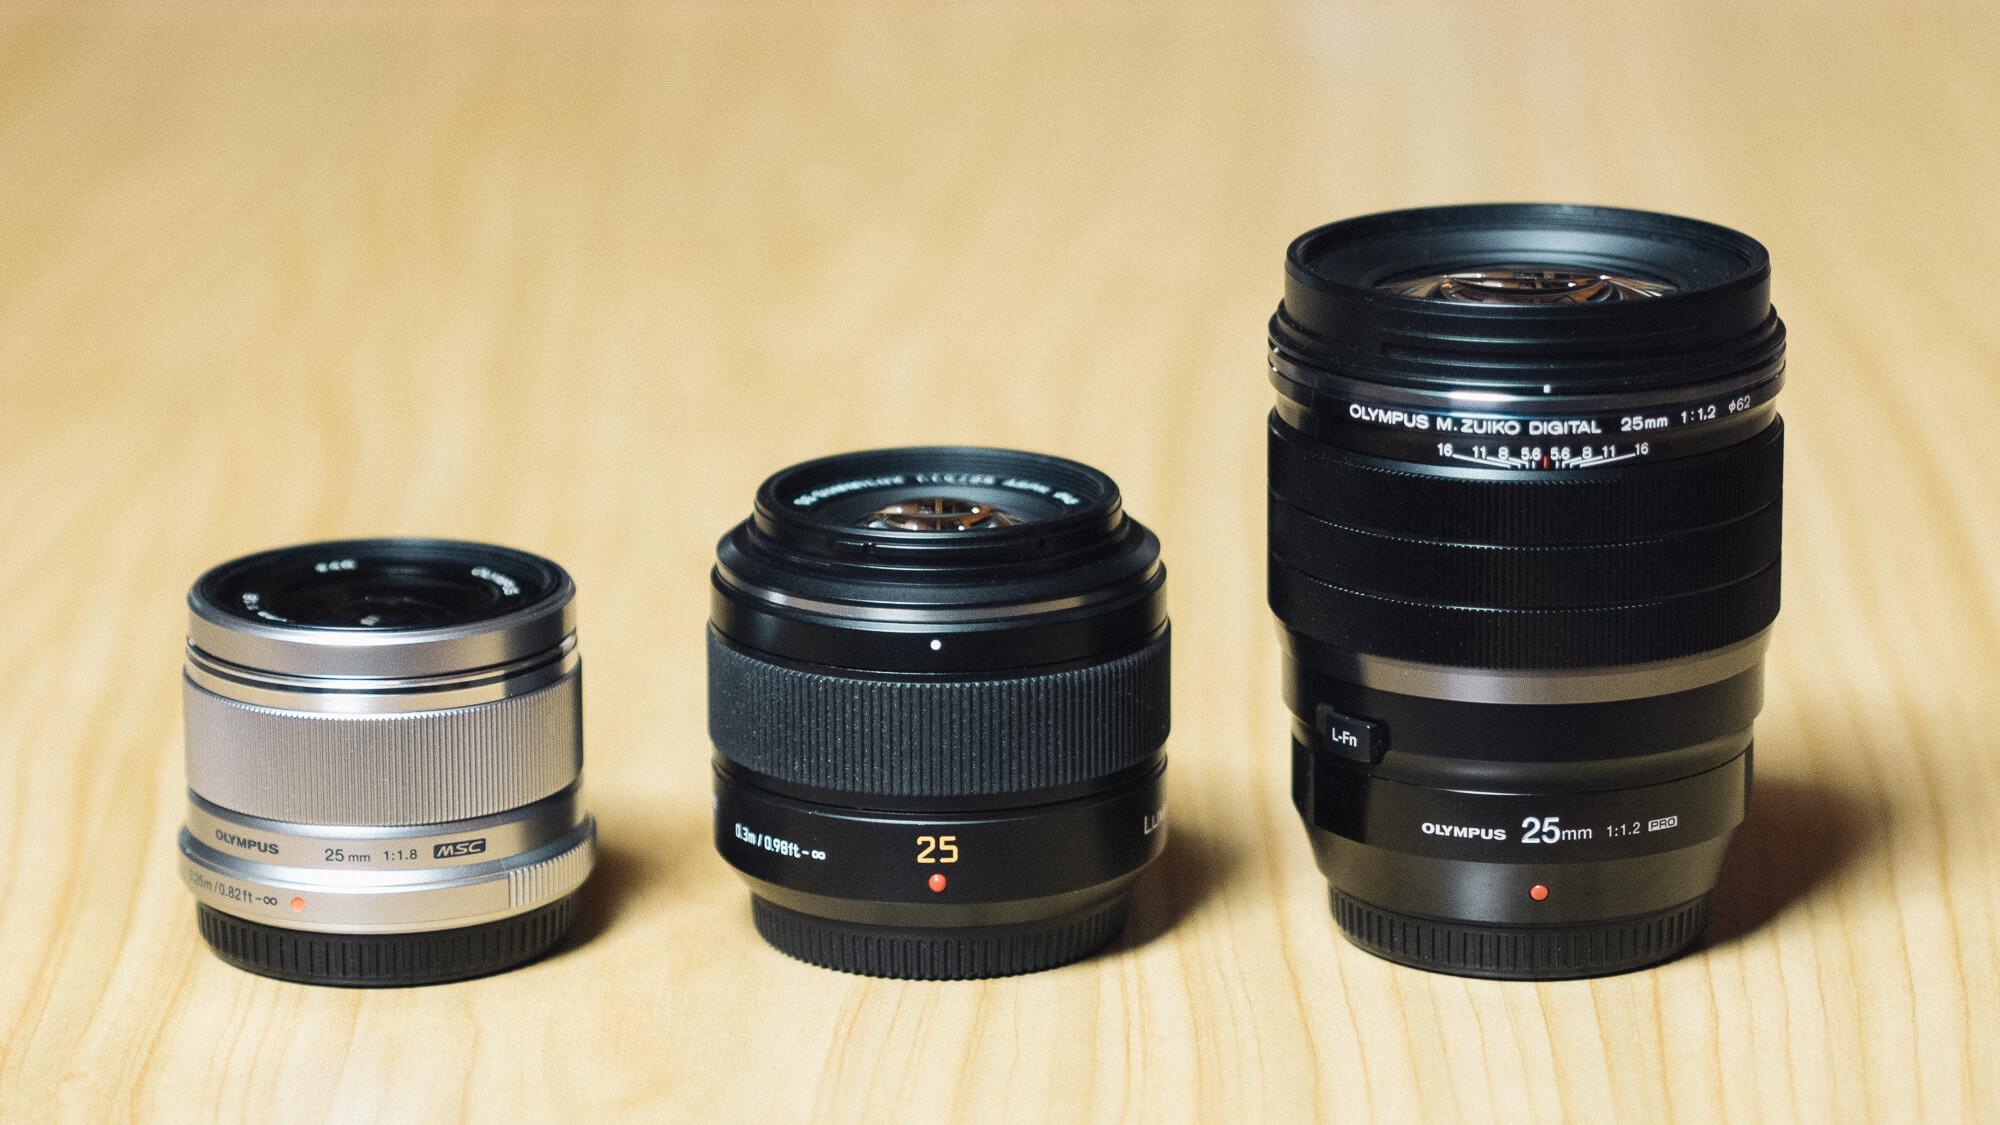 Olympus M.Zuiko 25mm F1.8 – Panasonic Leica Summilux 25mm F1.4 – Olympus M.Zuiko 25mm F1.2 Pro